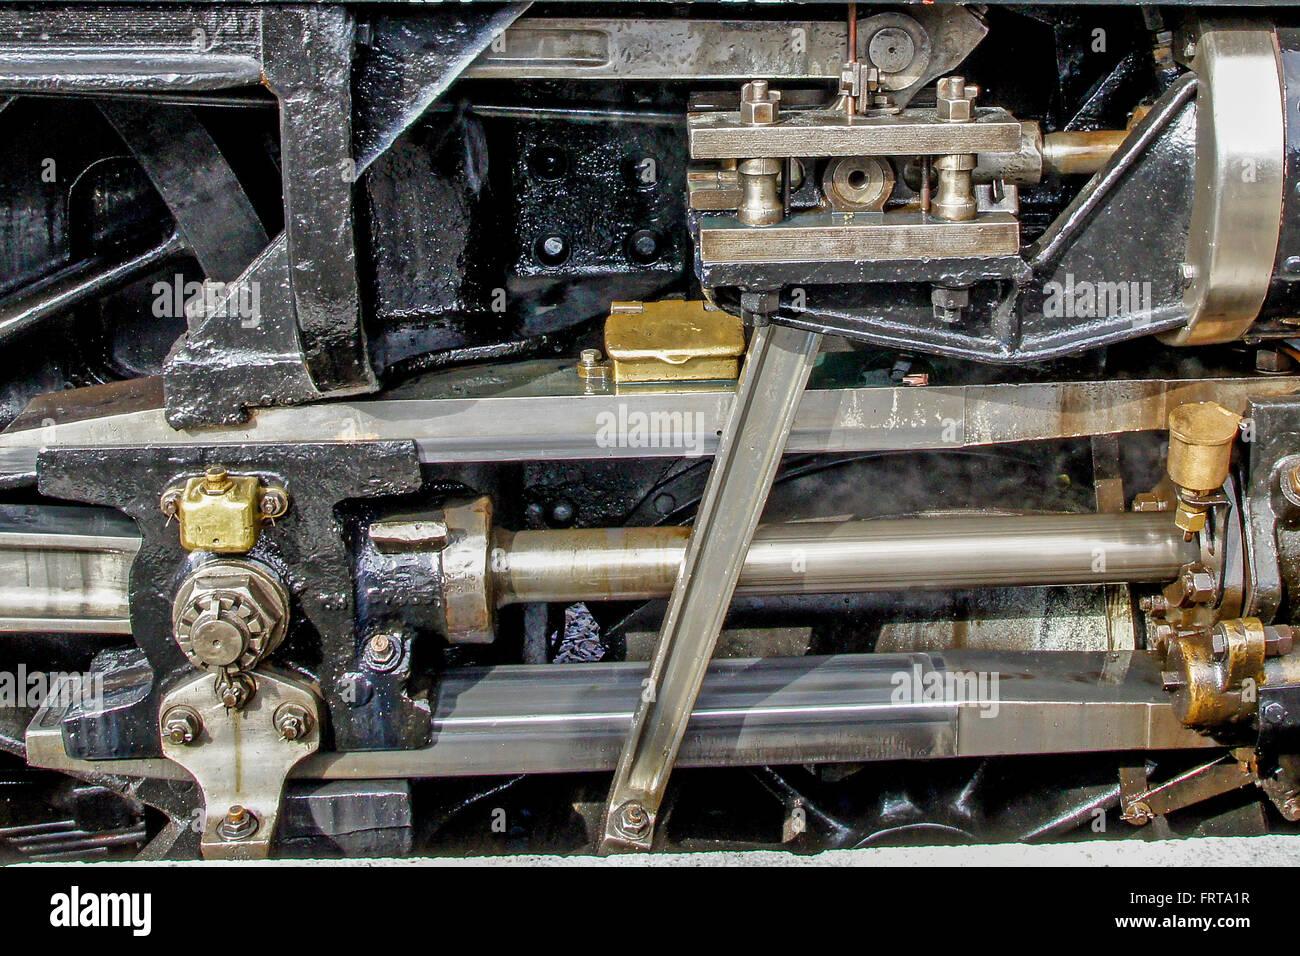 6100 Royal Scot pistons - Stock Image